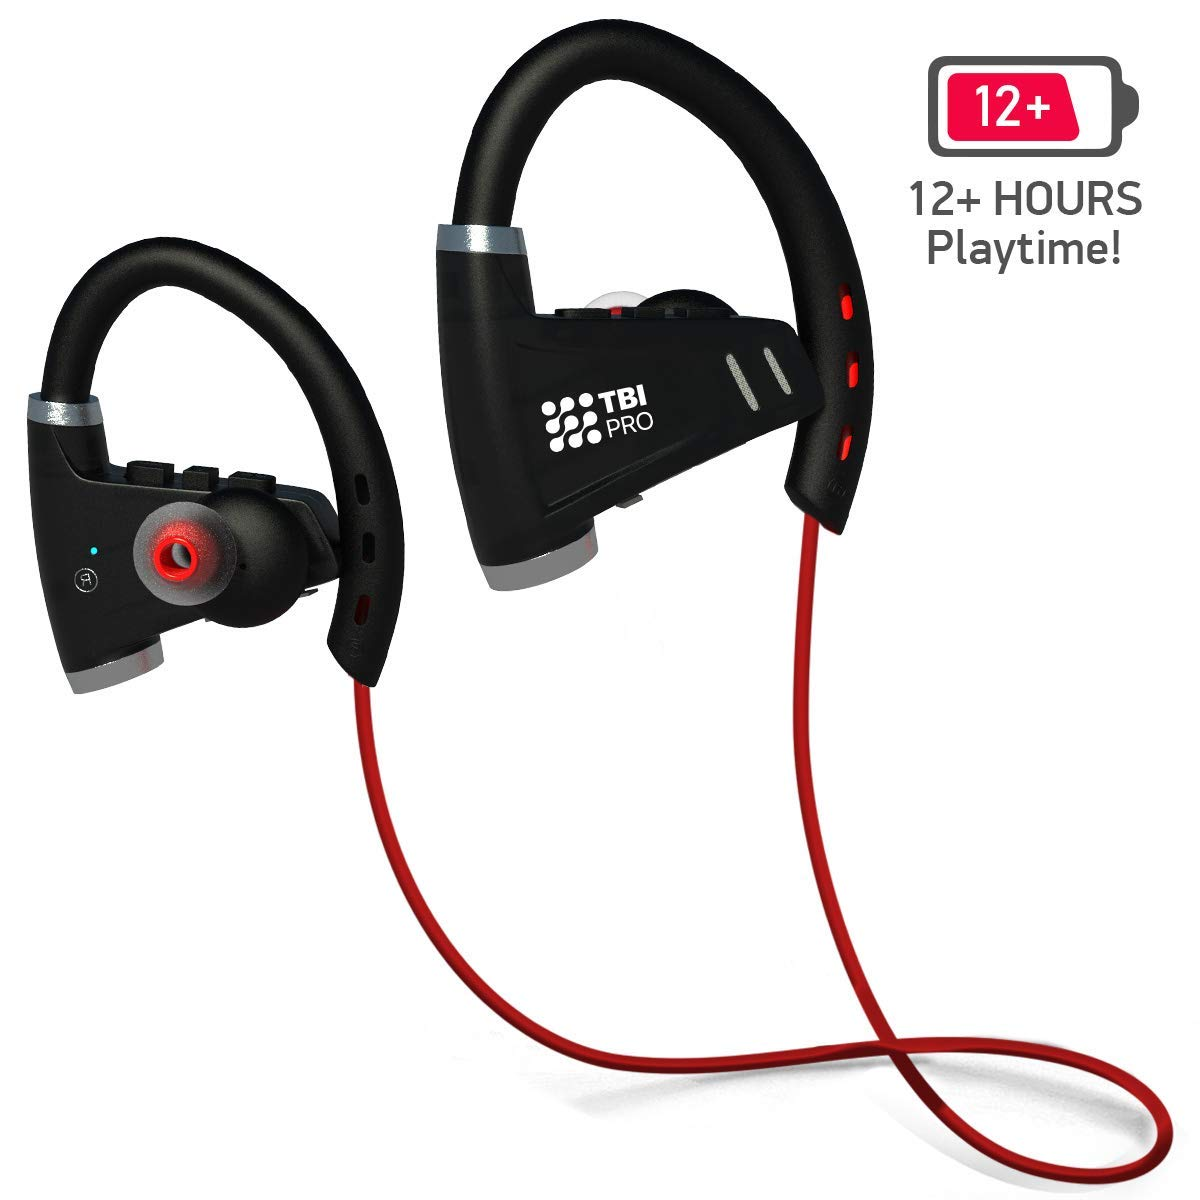 Newest 2019 Bluetooth Headphones W 12 Hours Battery Best Wireless Sport Earphones Mic Ipx7 Waterproof Music In Ear Earbuds Gym Running Workout Men Women Big Nano Best Shopping Destination For Tech Lovers